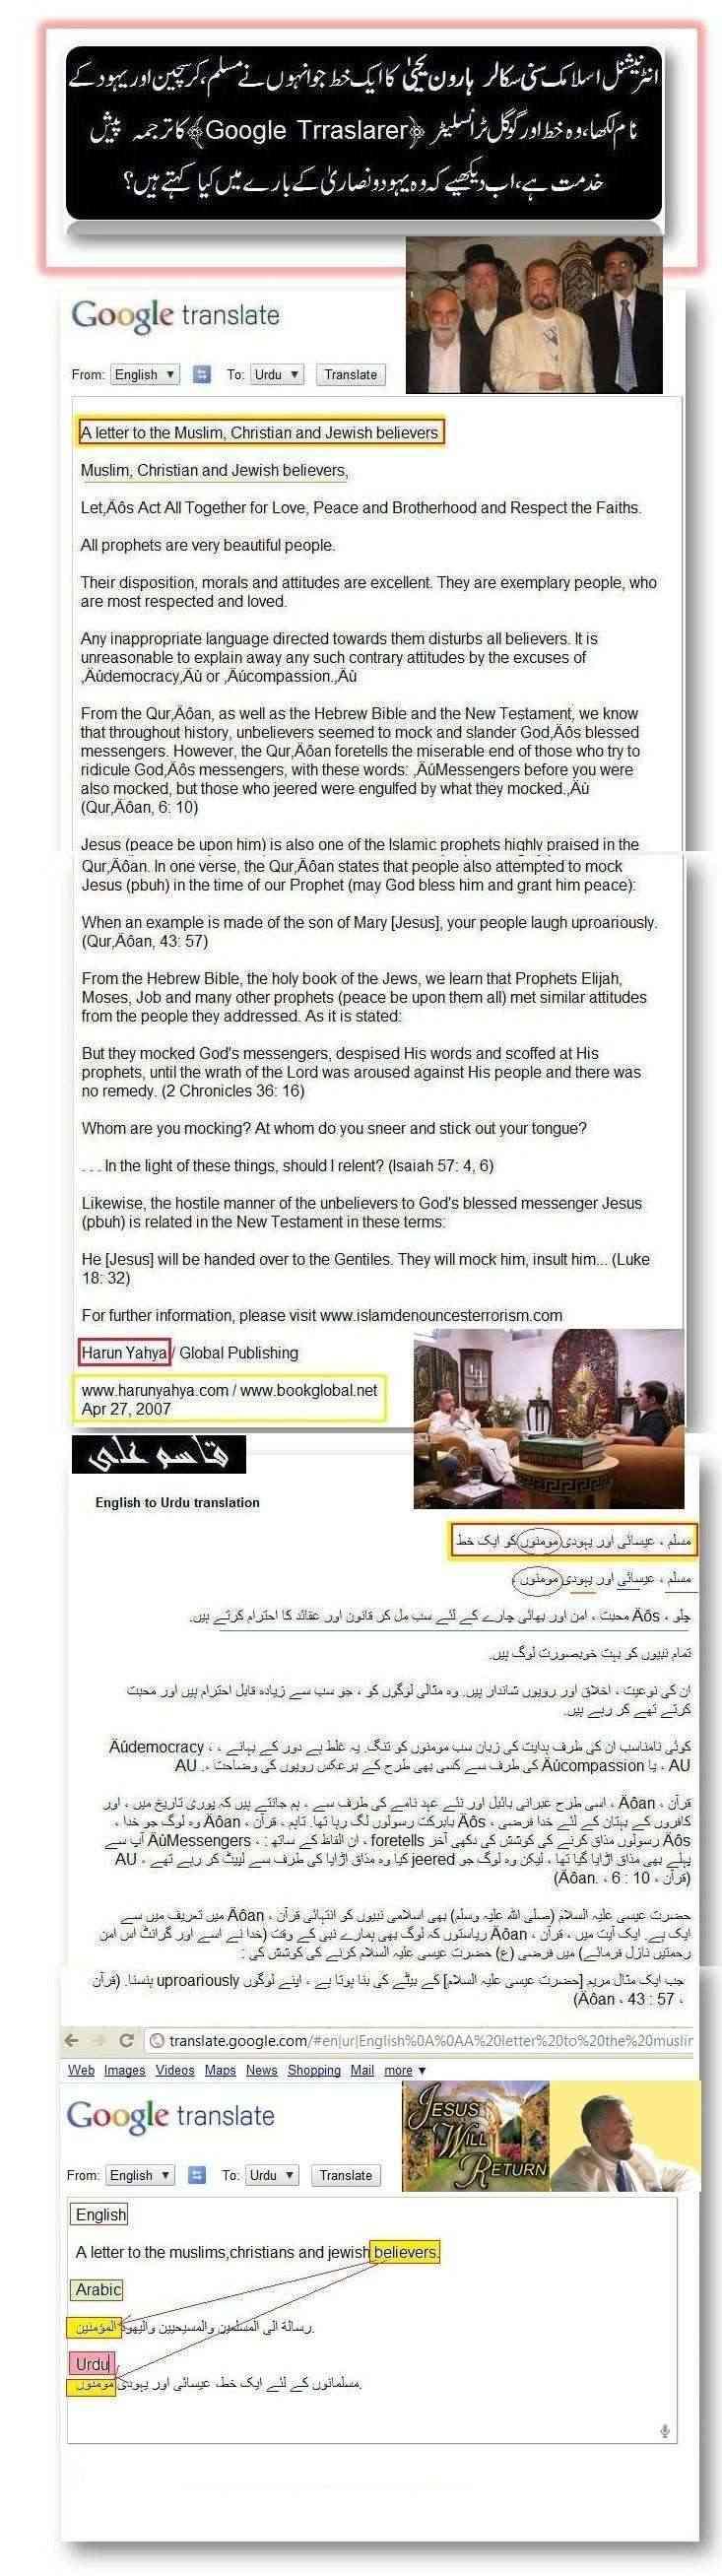 fazal fatwa Fatwa_19